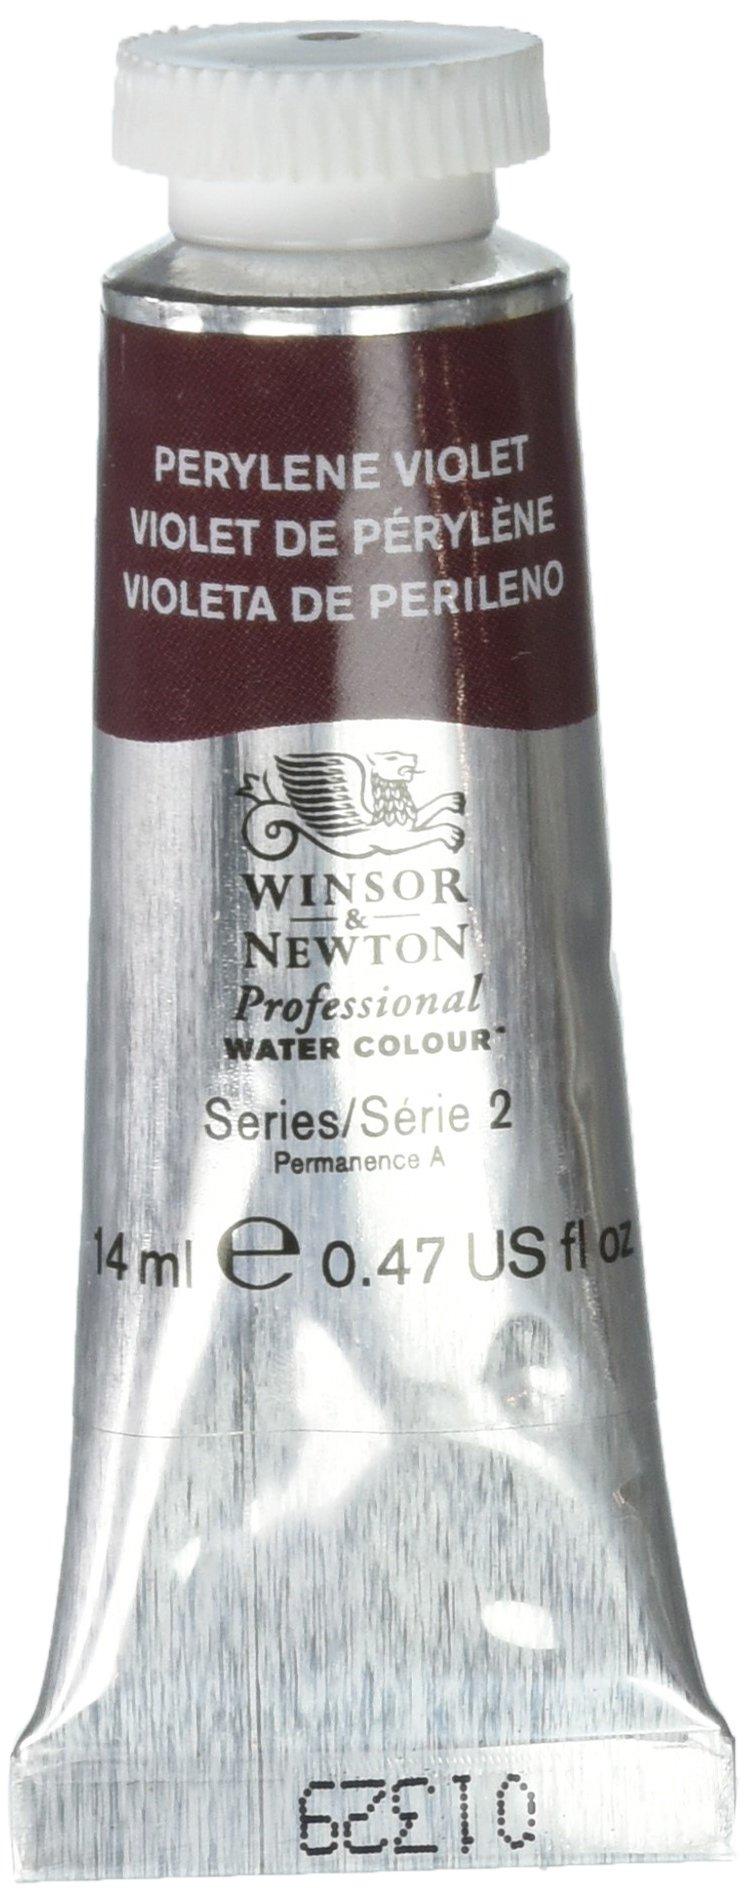 Colart Americas 0105470 Pro Wc Perylene Violet